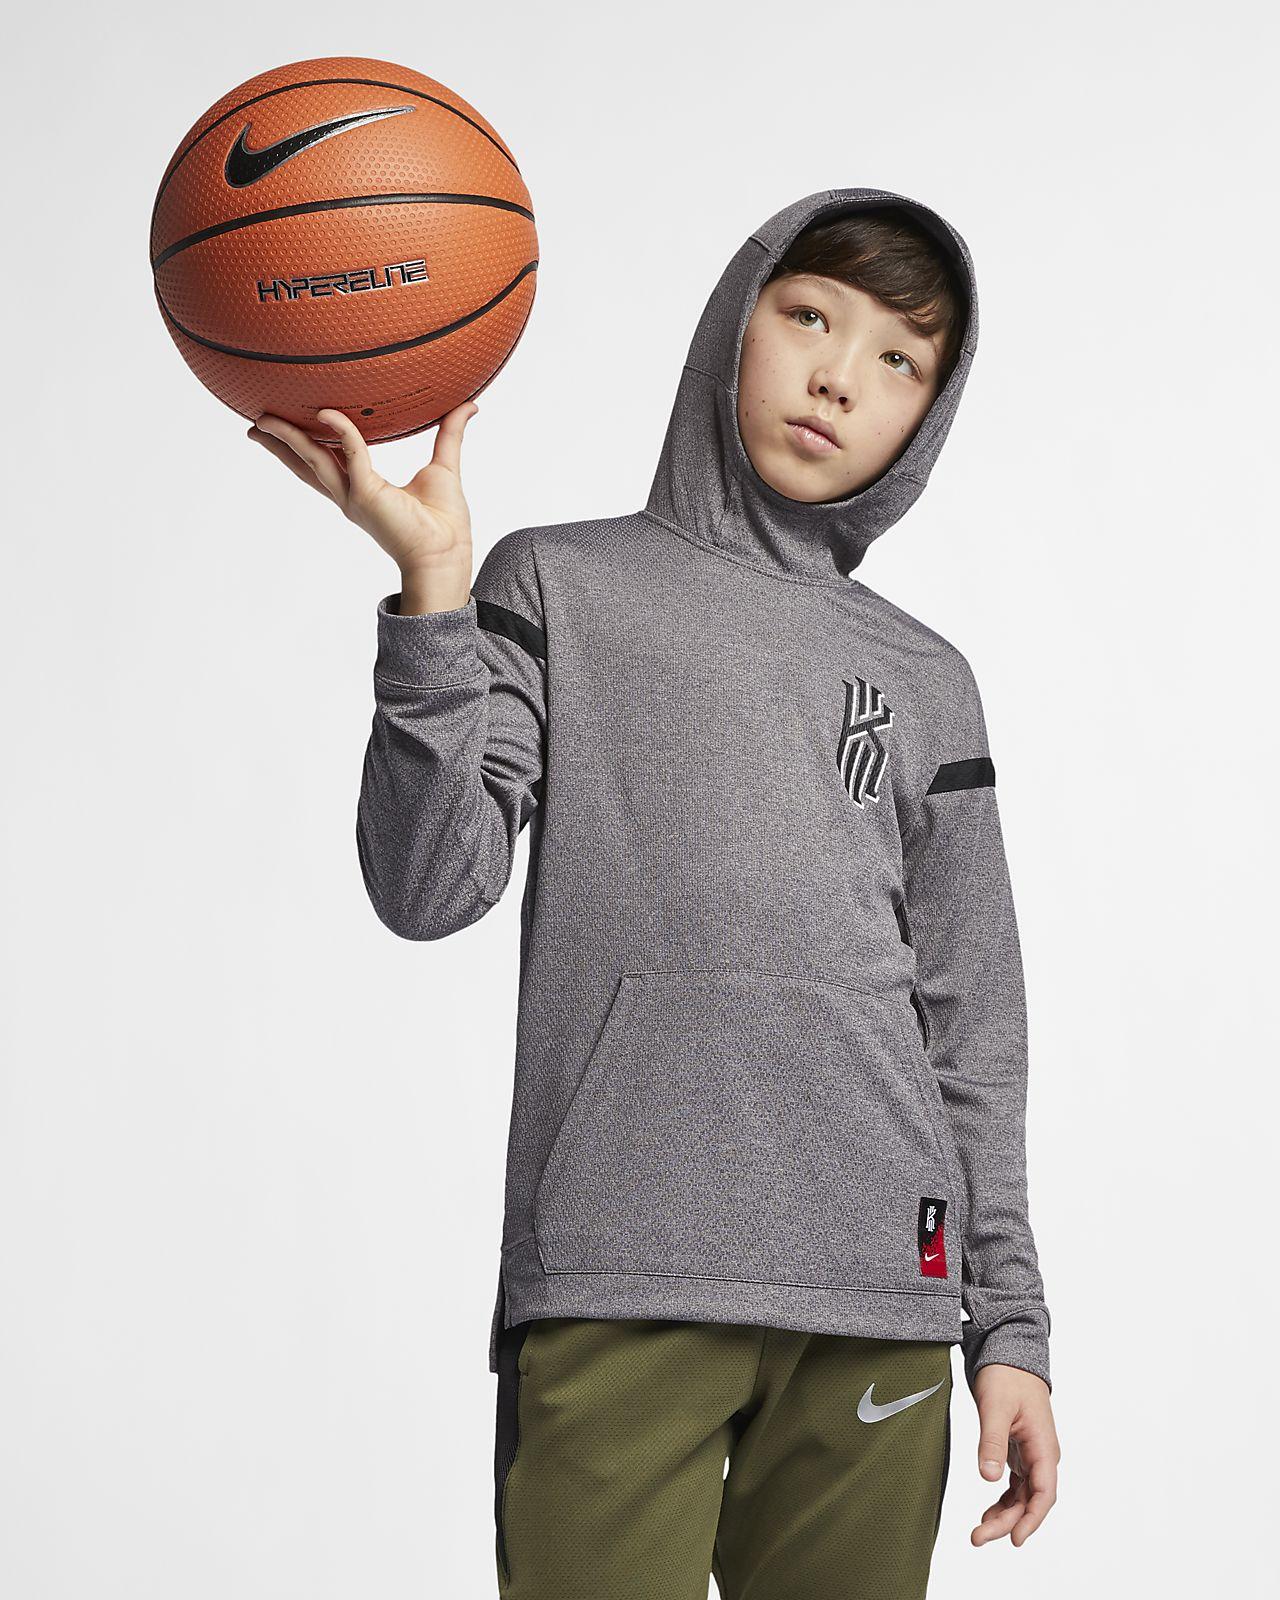 0020c5edaea9 Nike Dri-FIT Kyrie Big Kids  (Boy s) Basketball Hoodie. Nike.com